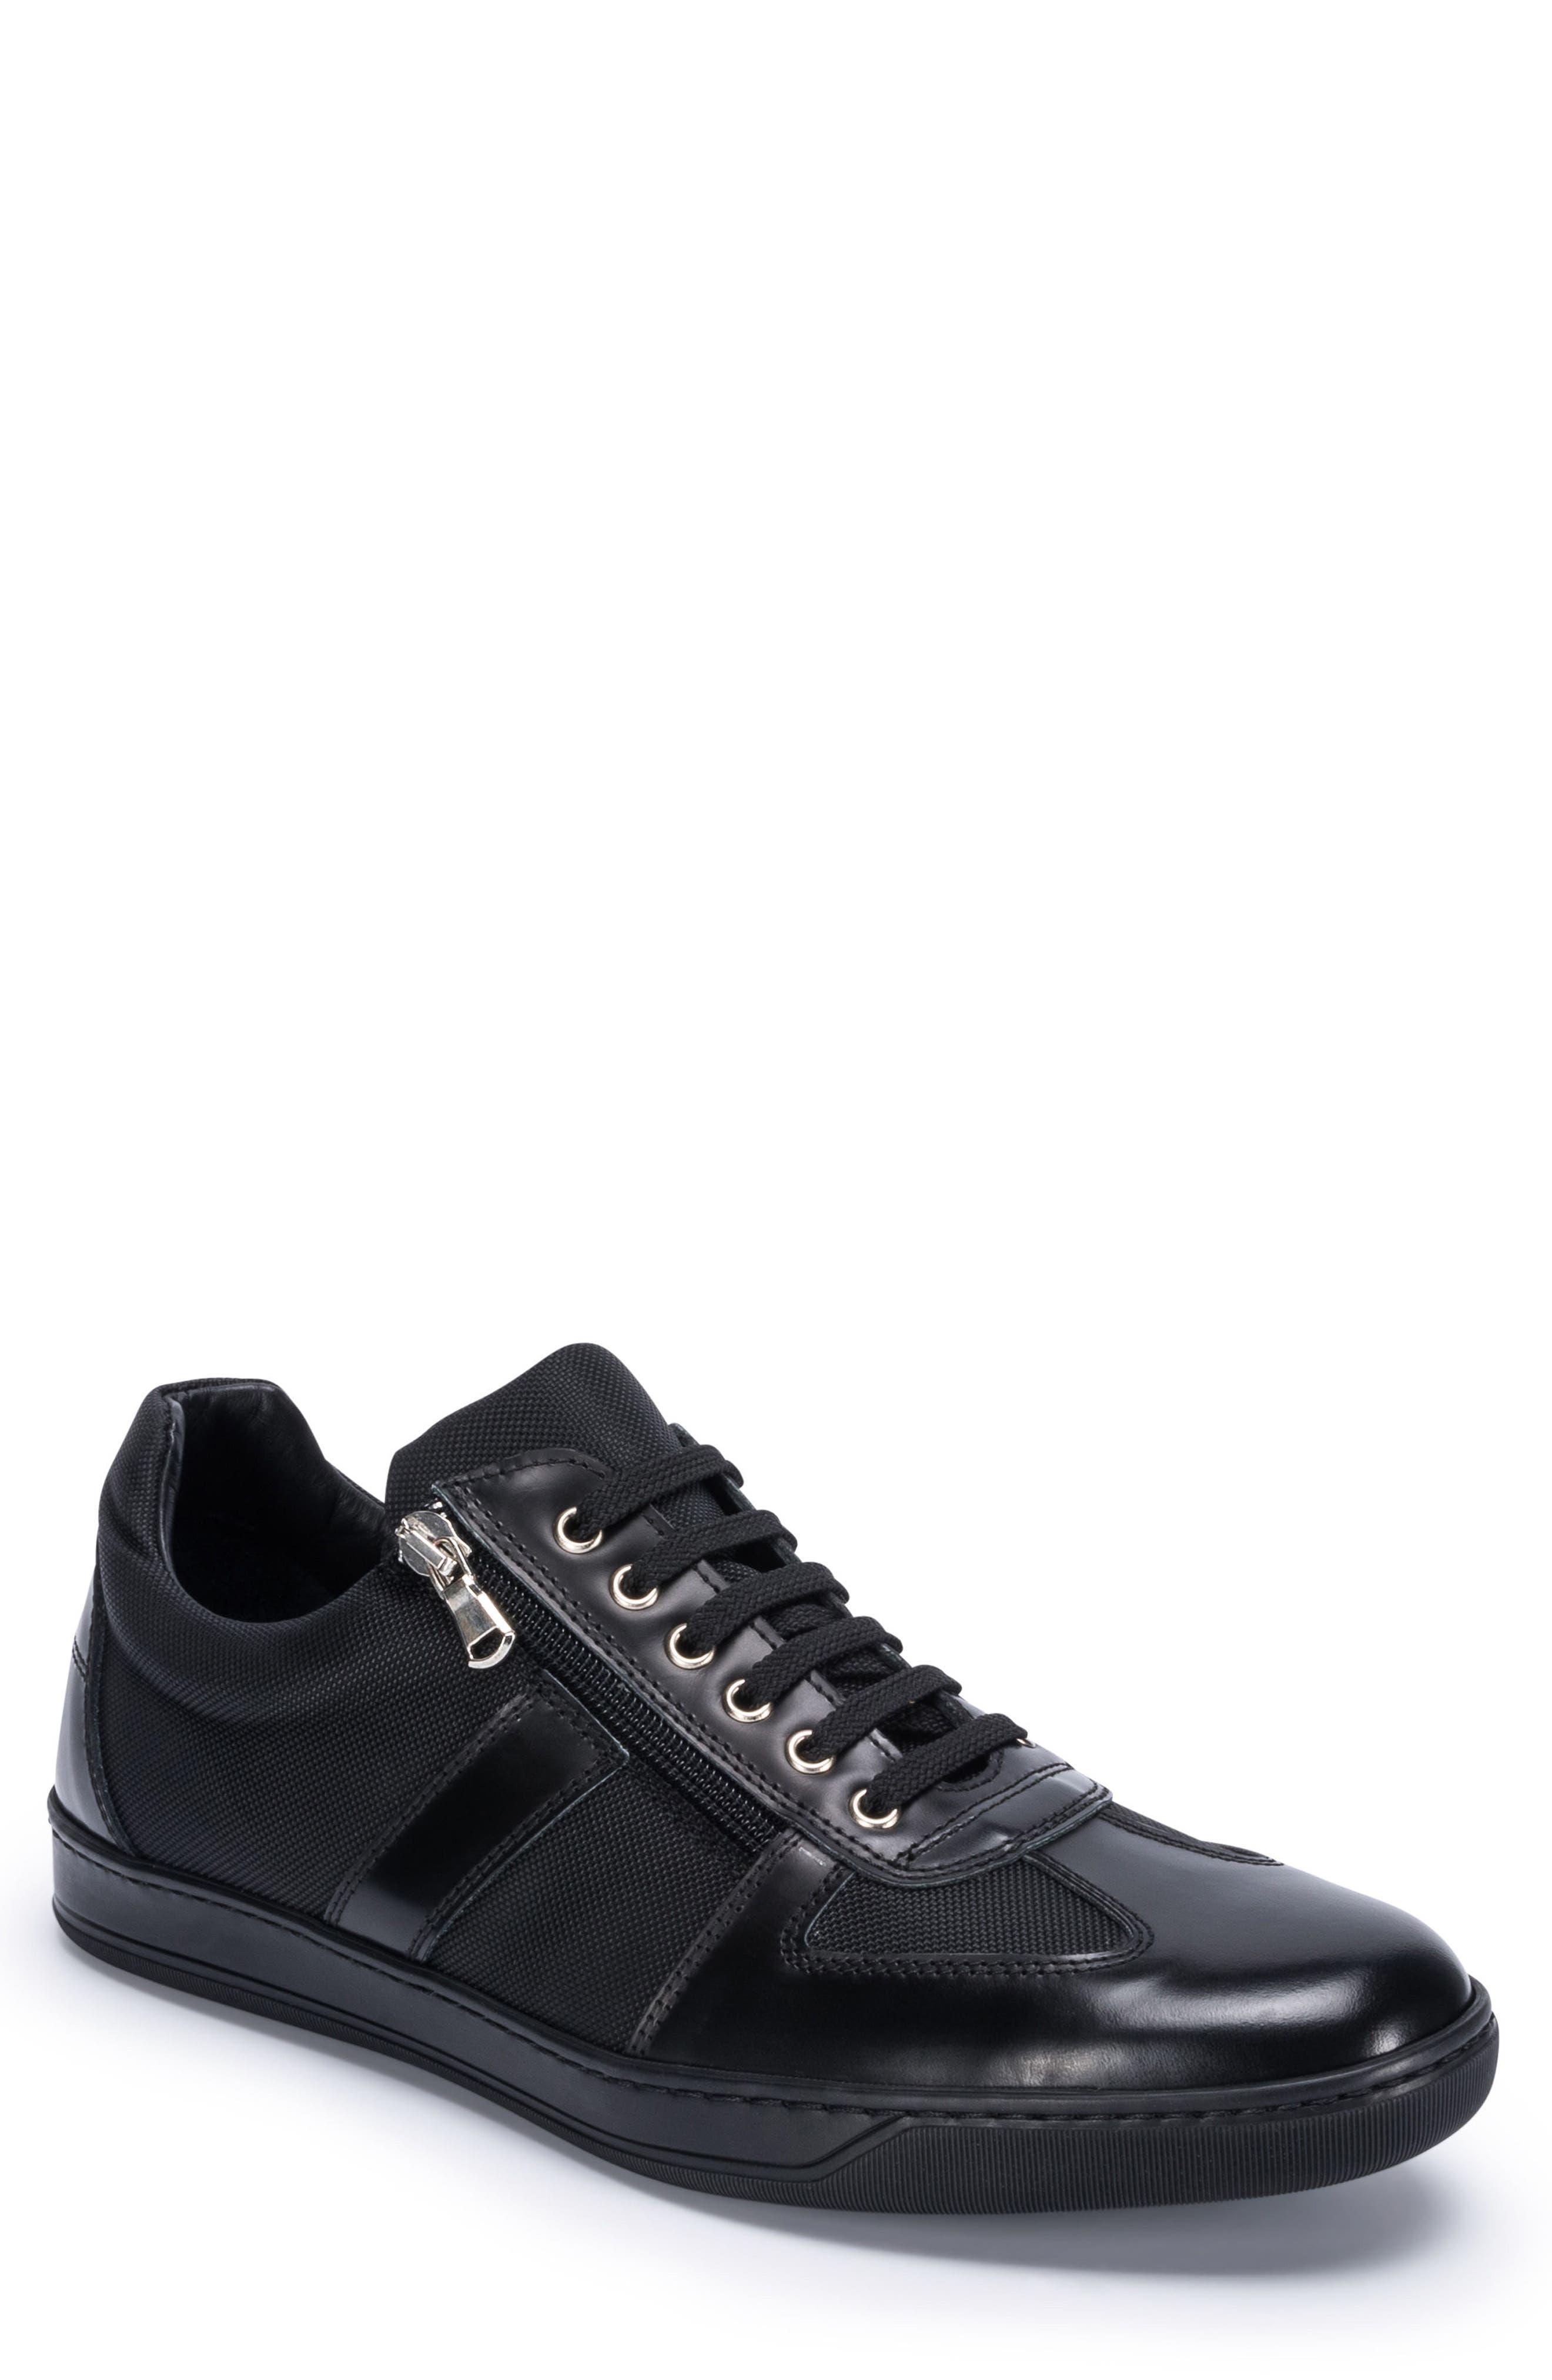 Paris Sneaker,                             Main thumbnail 1, color,                             Black